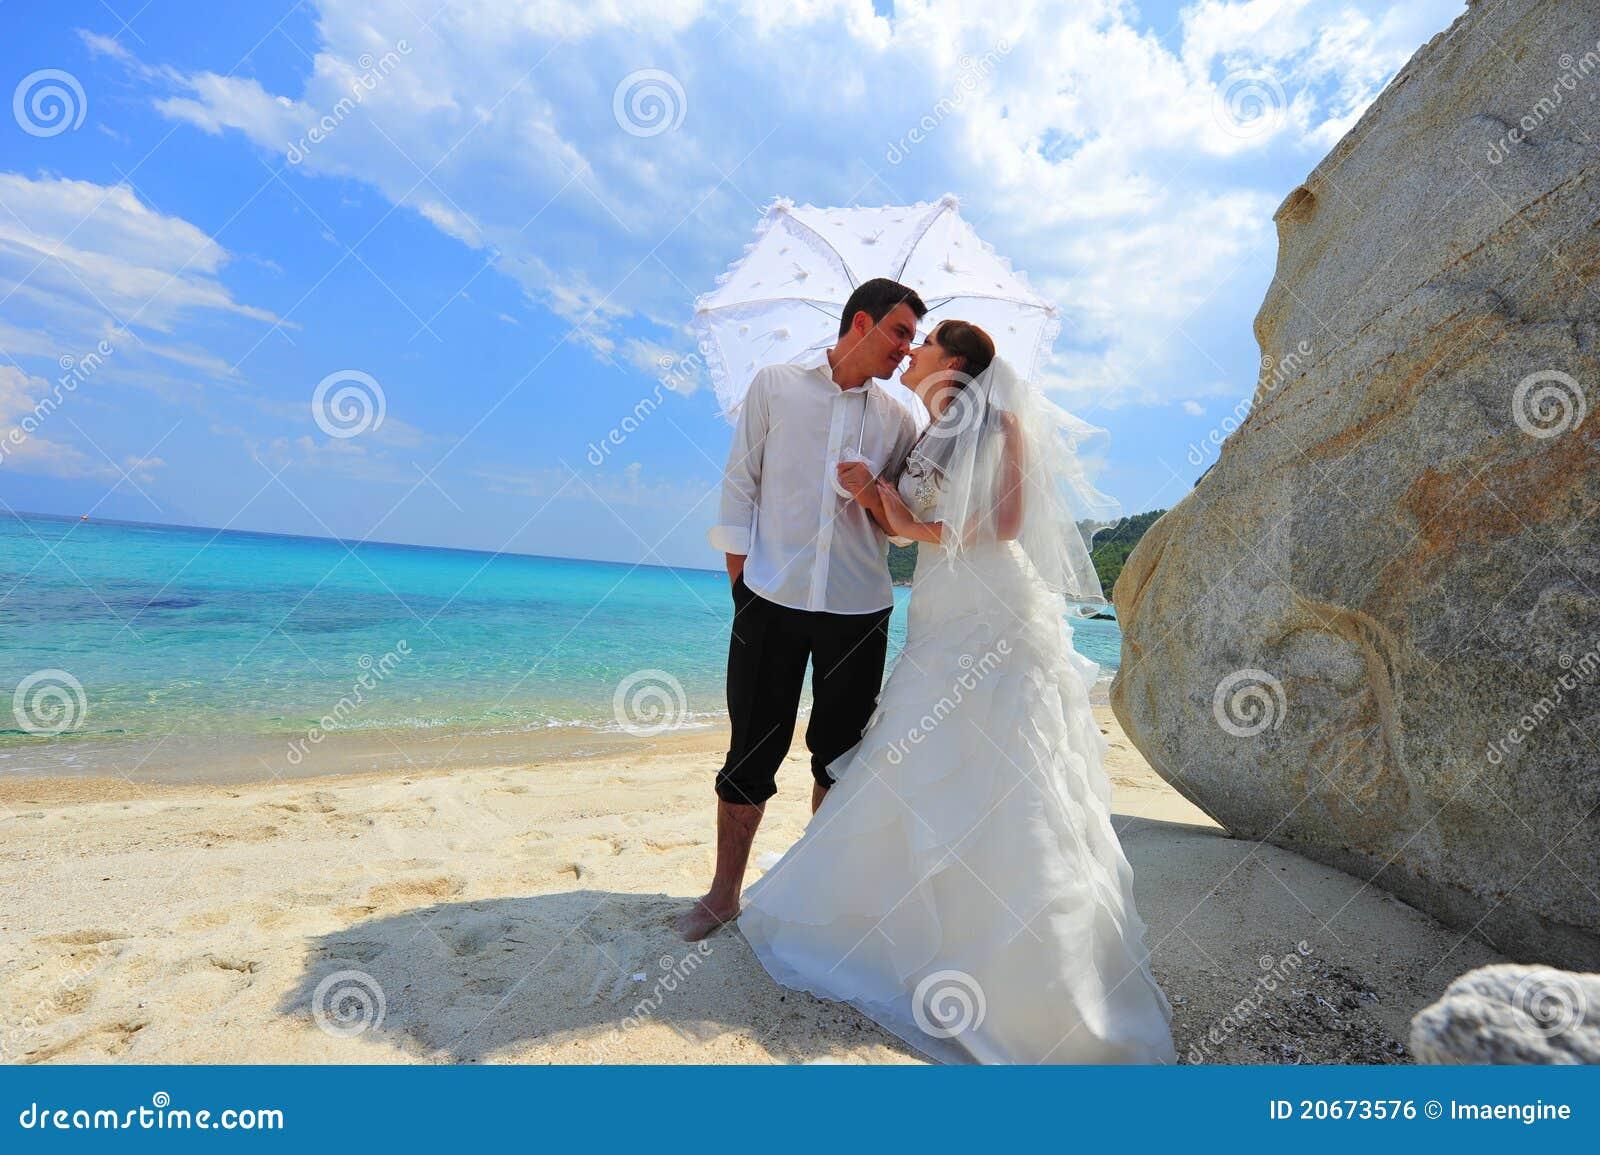 Love Umbrella Newlyweds Couple On Exotic Beach Royalty